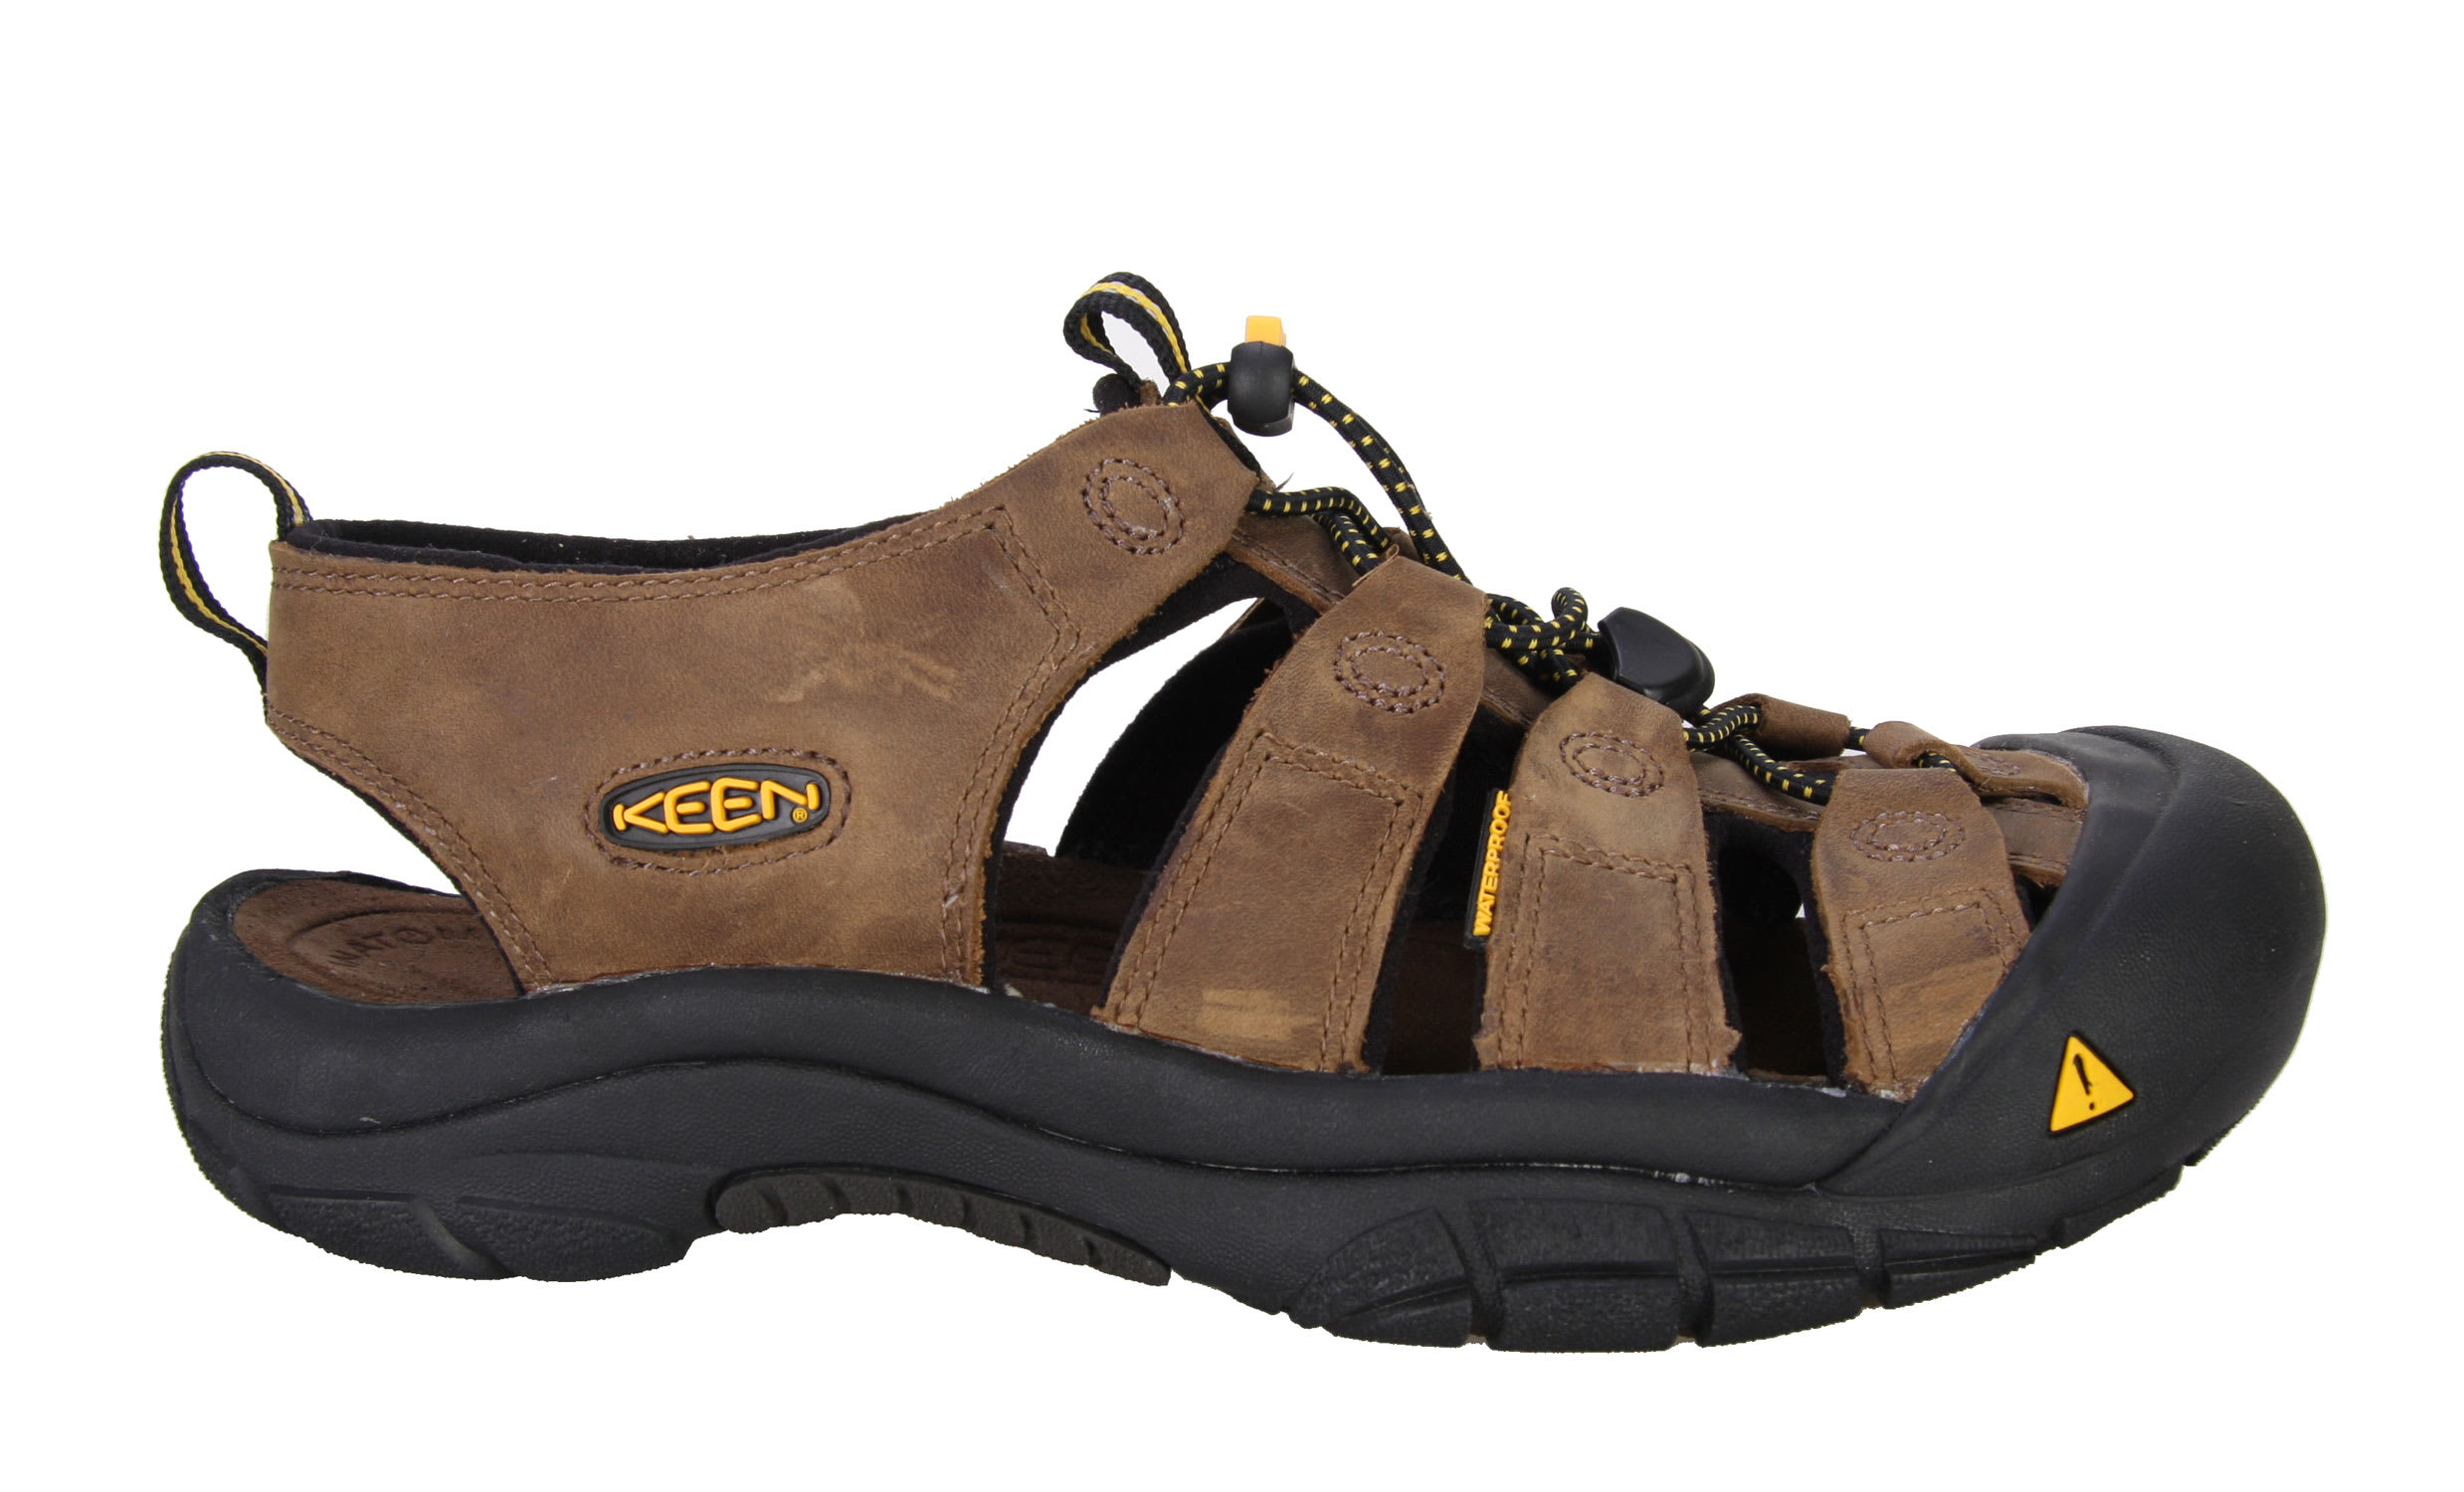 7853a265e9f9 Keen Newport Water Shoes - thumbnail 1